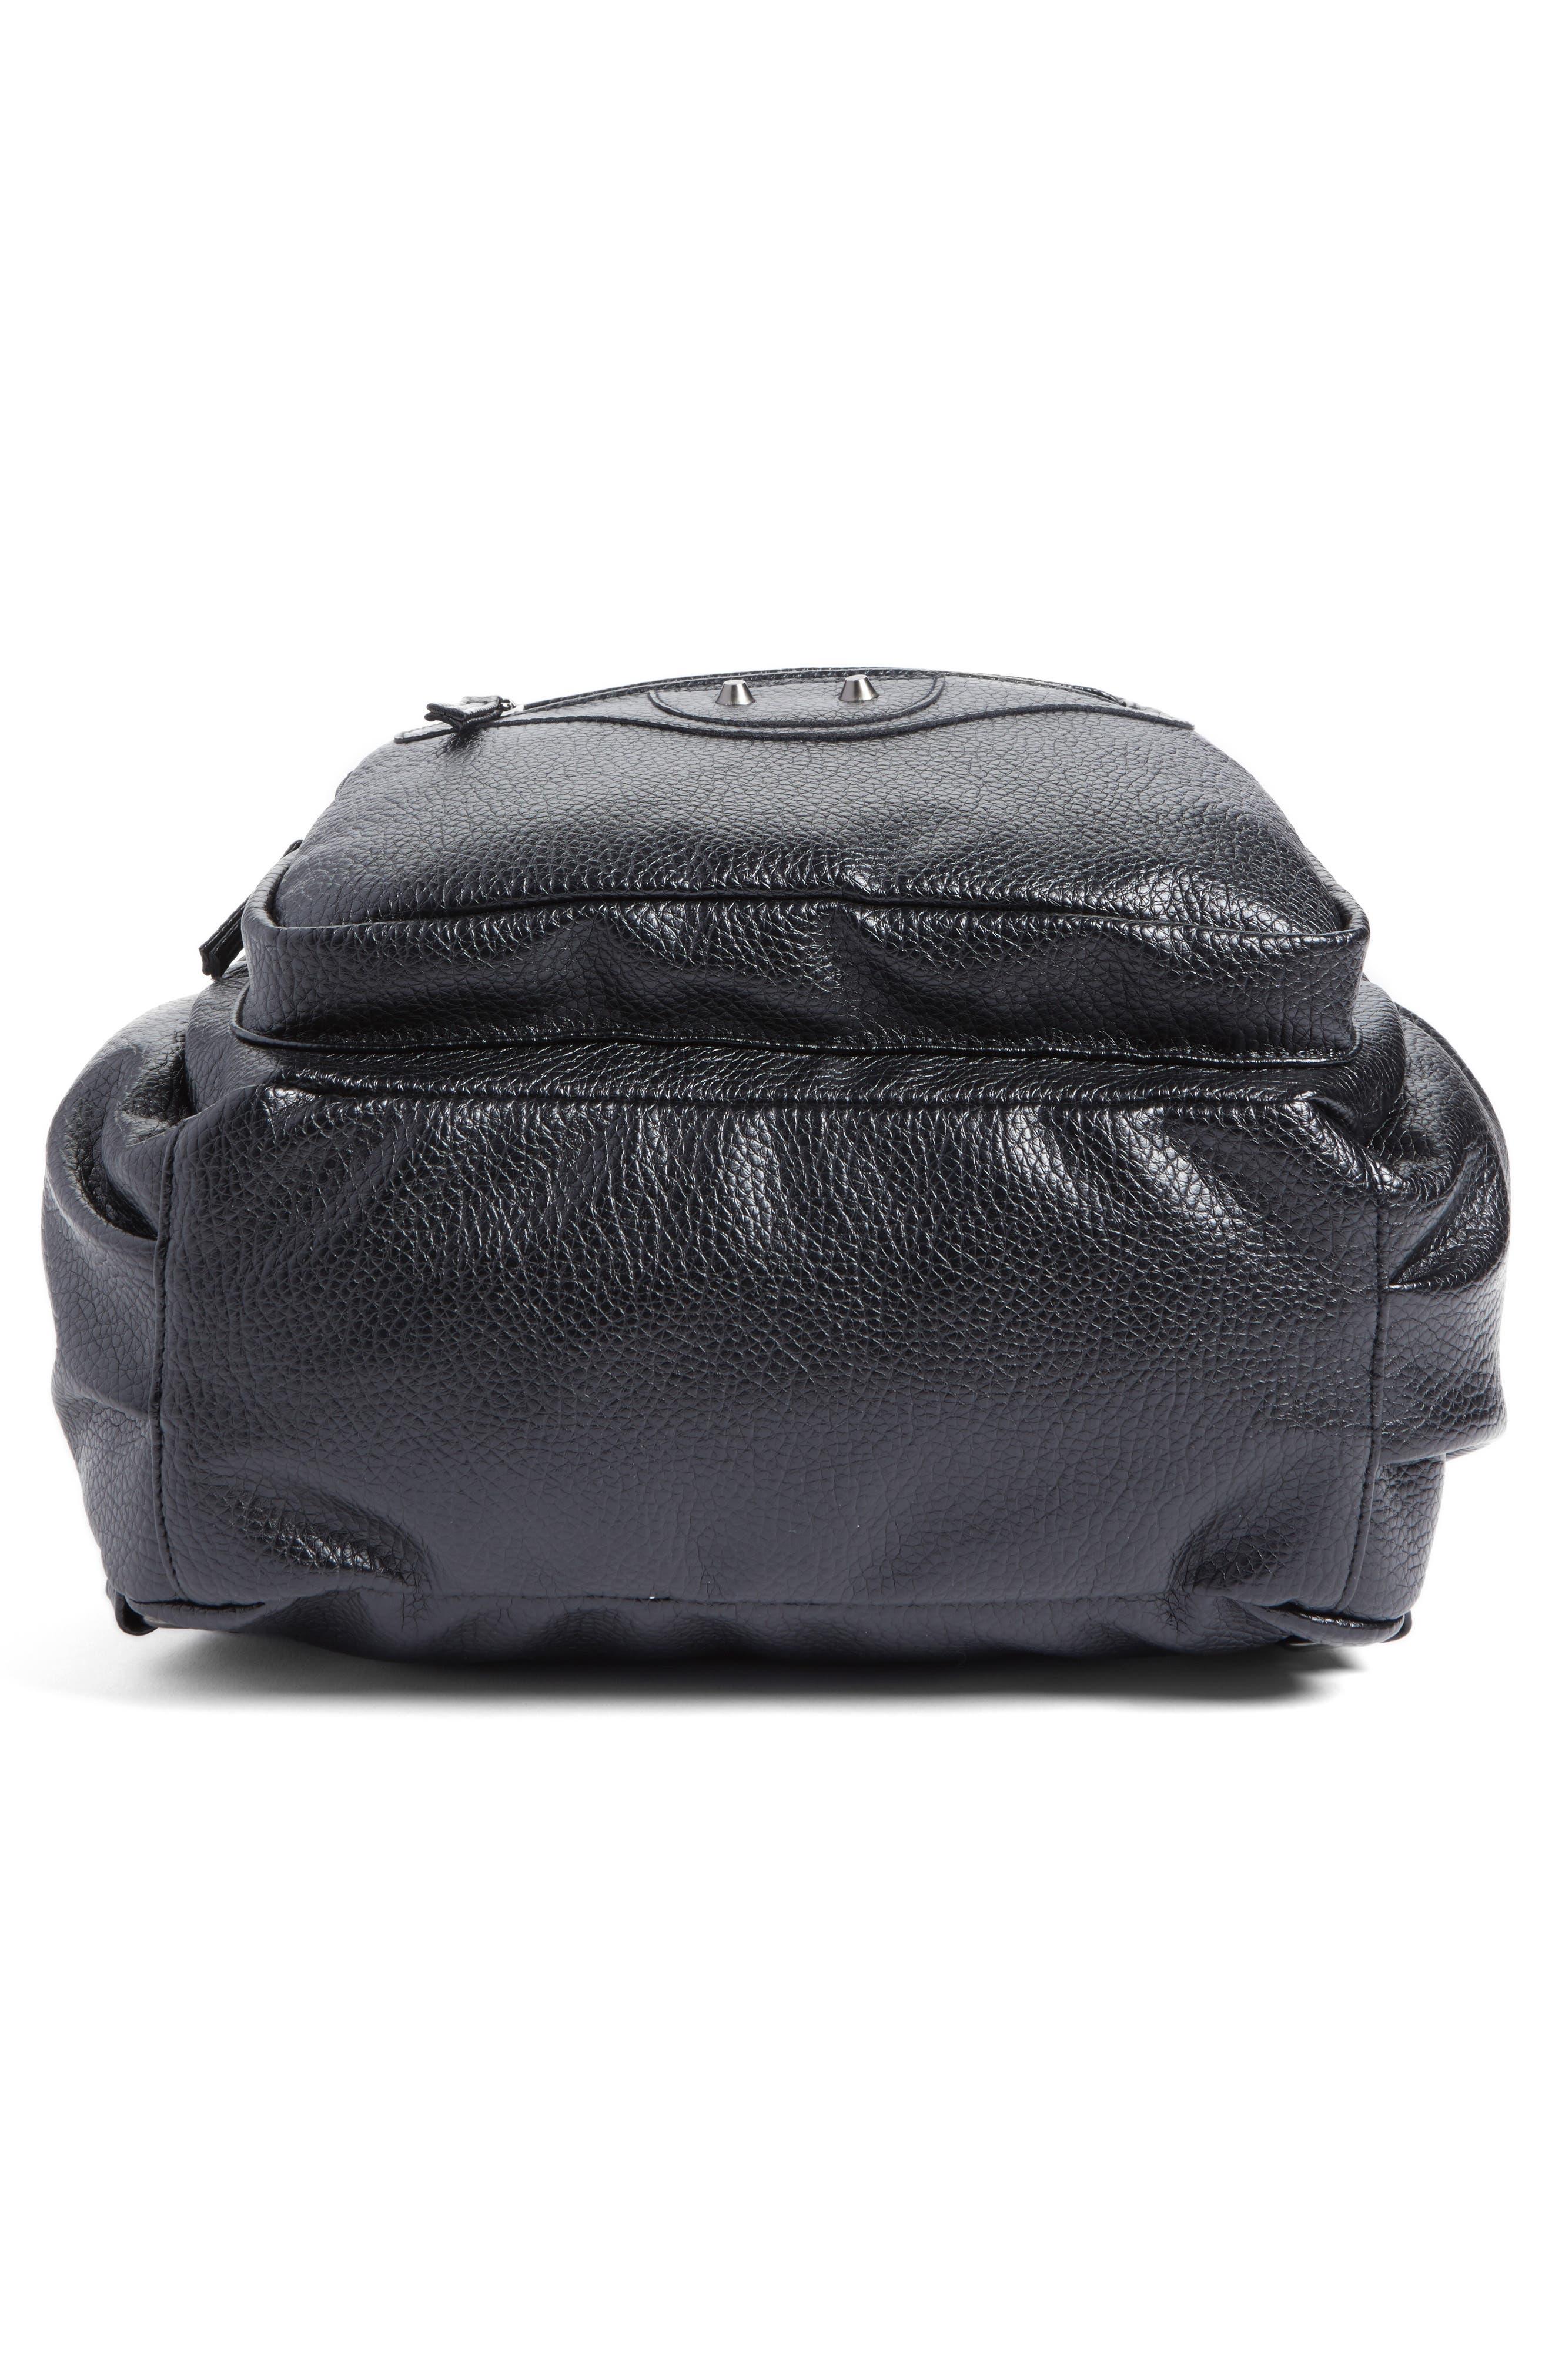 Embroidered Backpack,                             Alternate thumbnail 5, color,                             Black